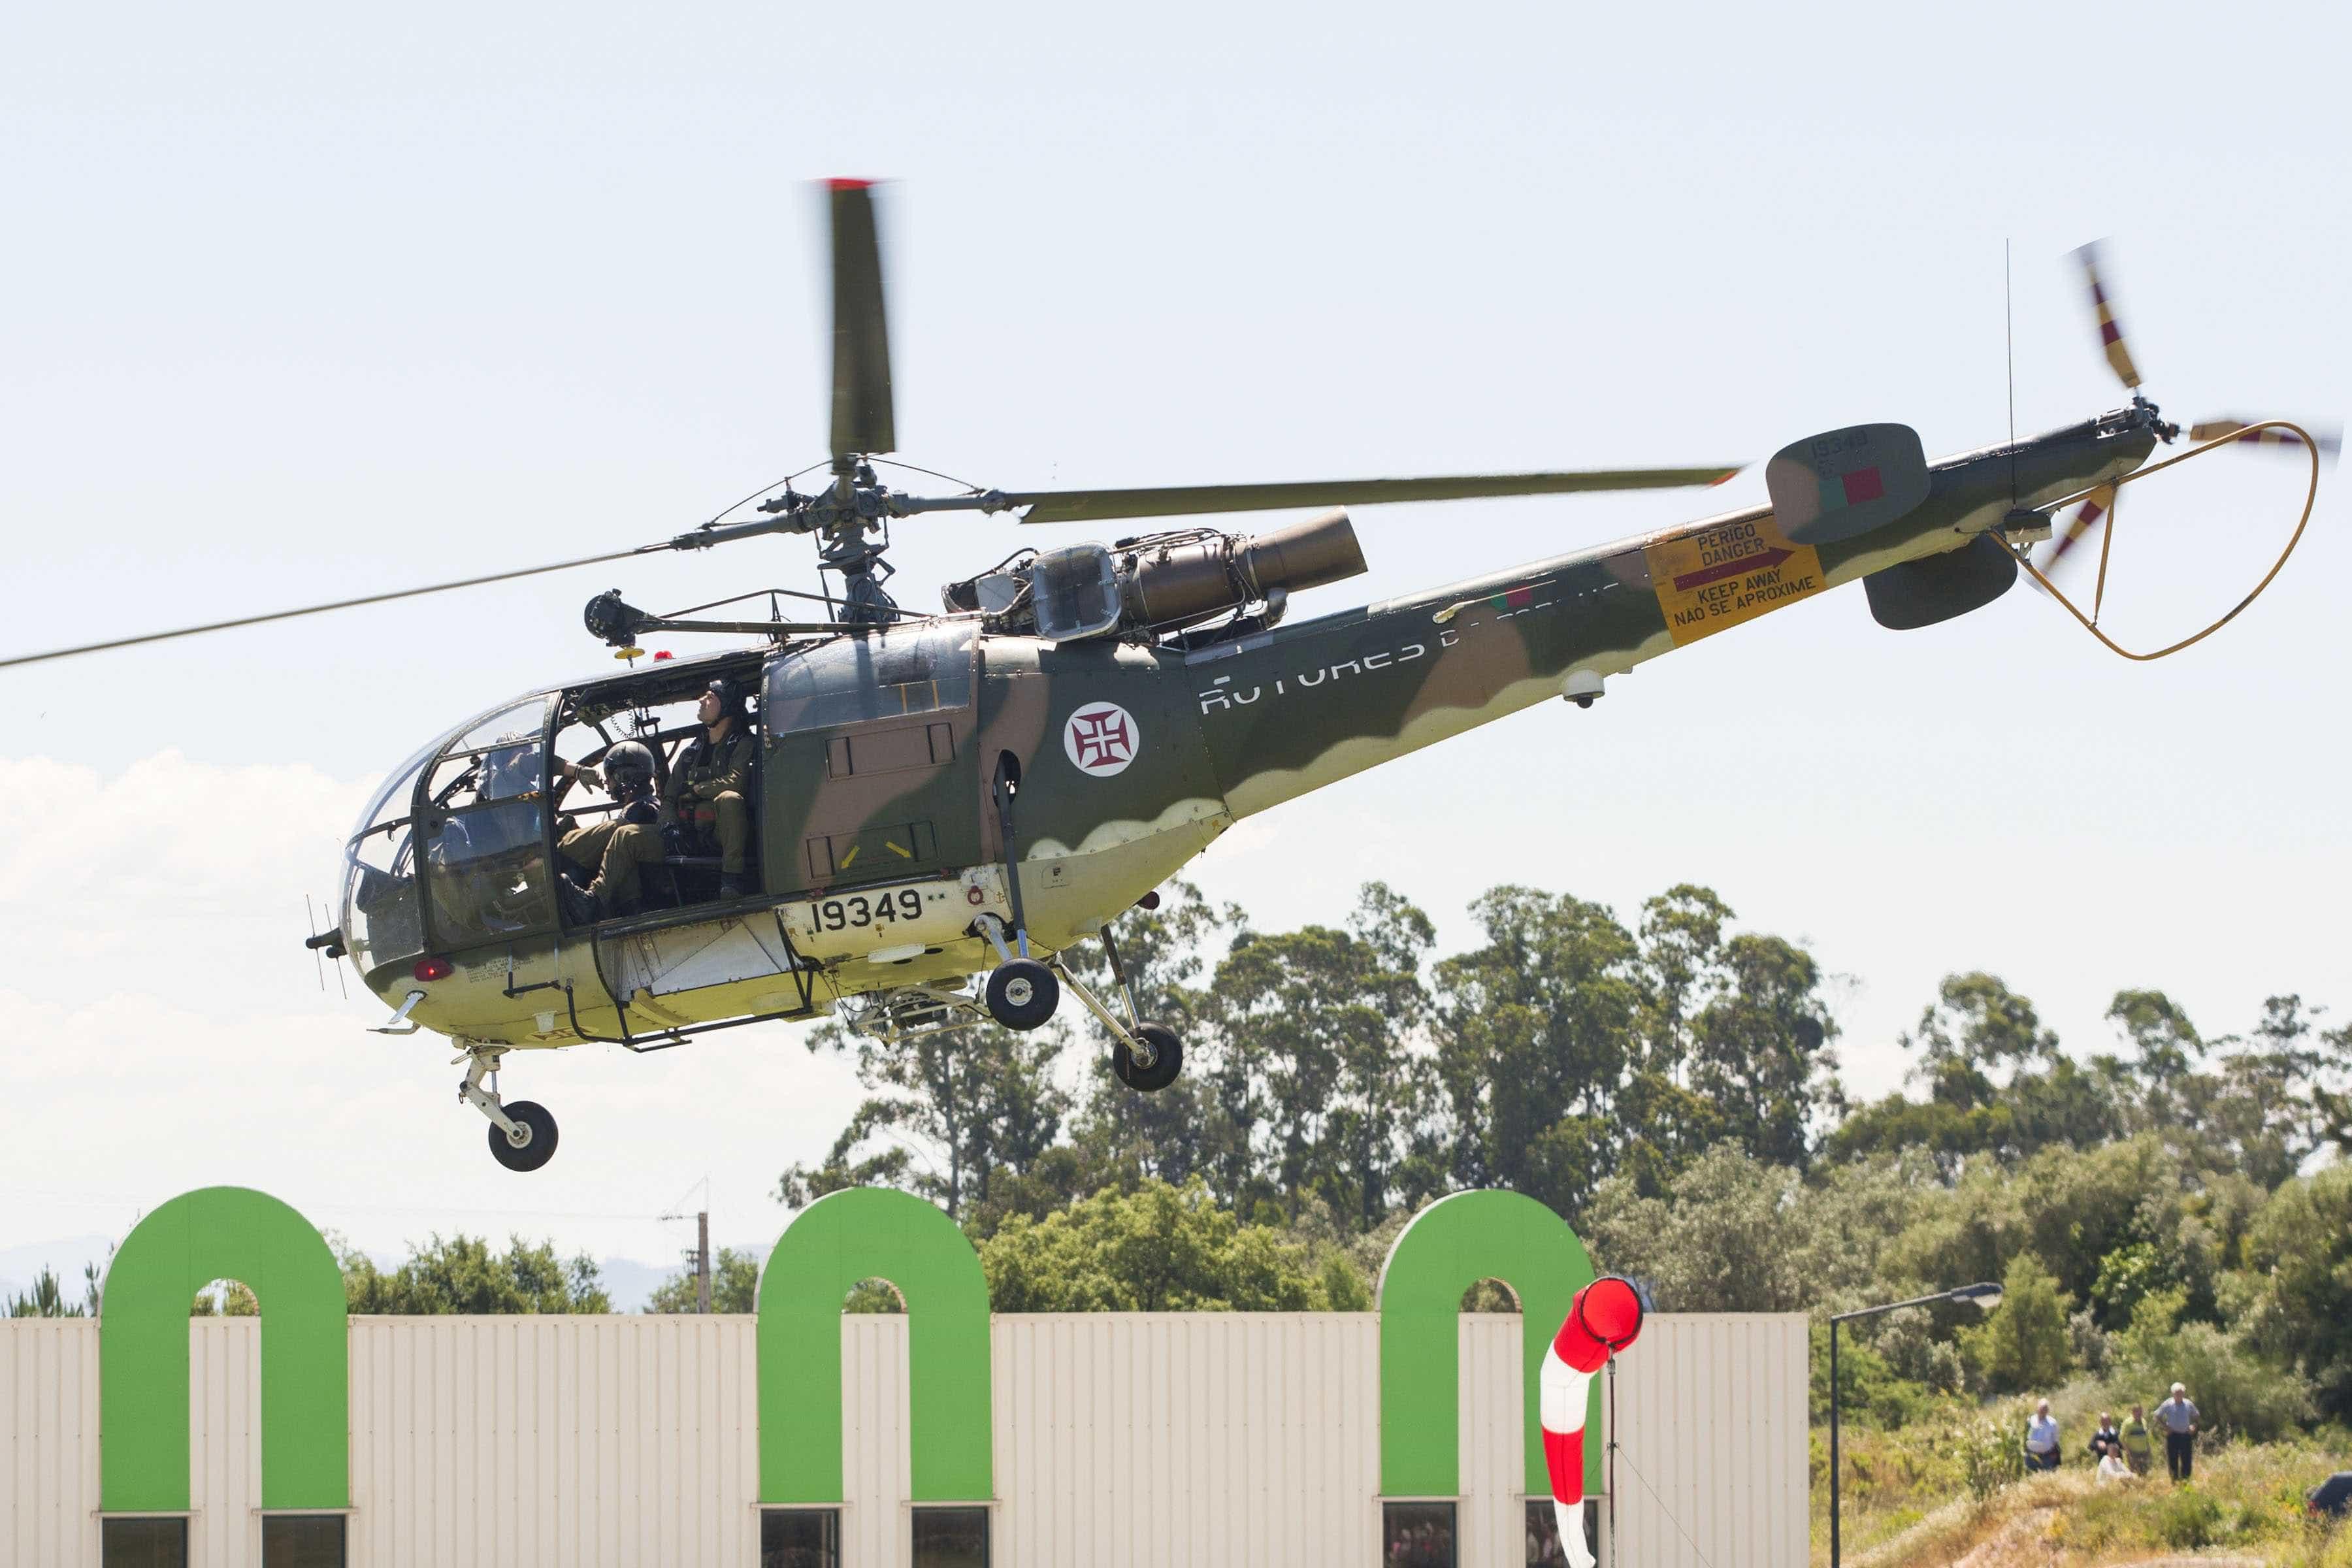 Portugal consagrou 1,35% do PIB à Defesa em 2018, longe da meta da NATO